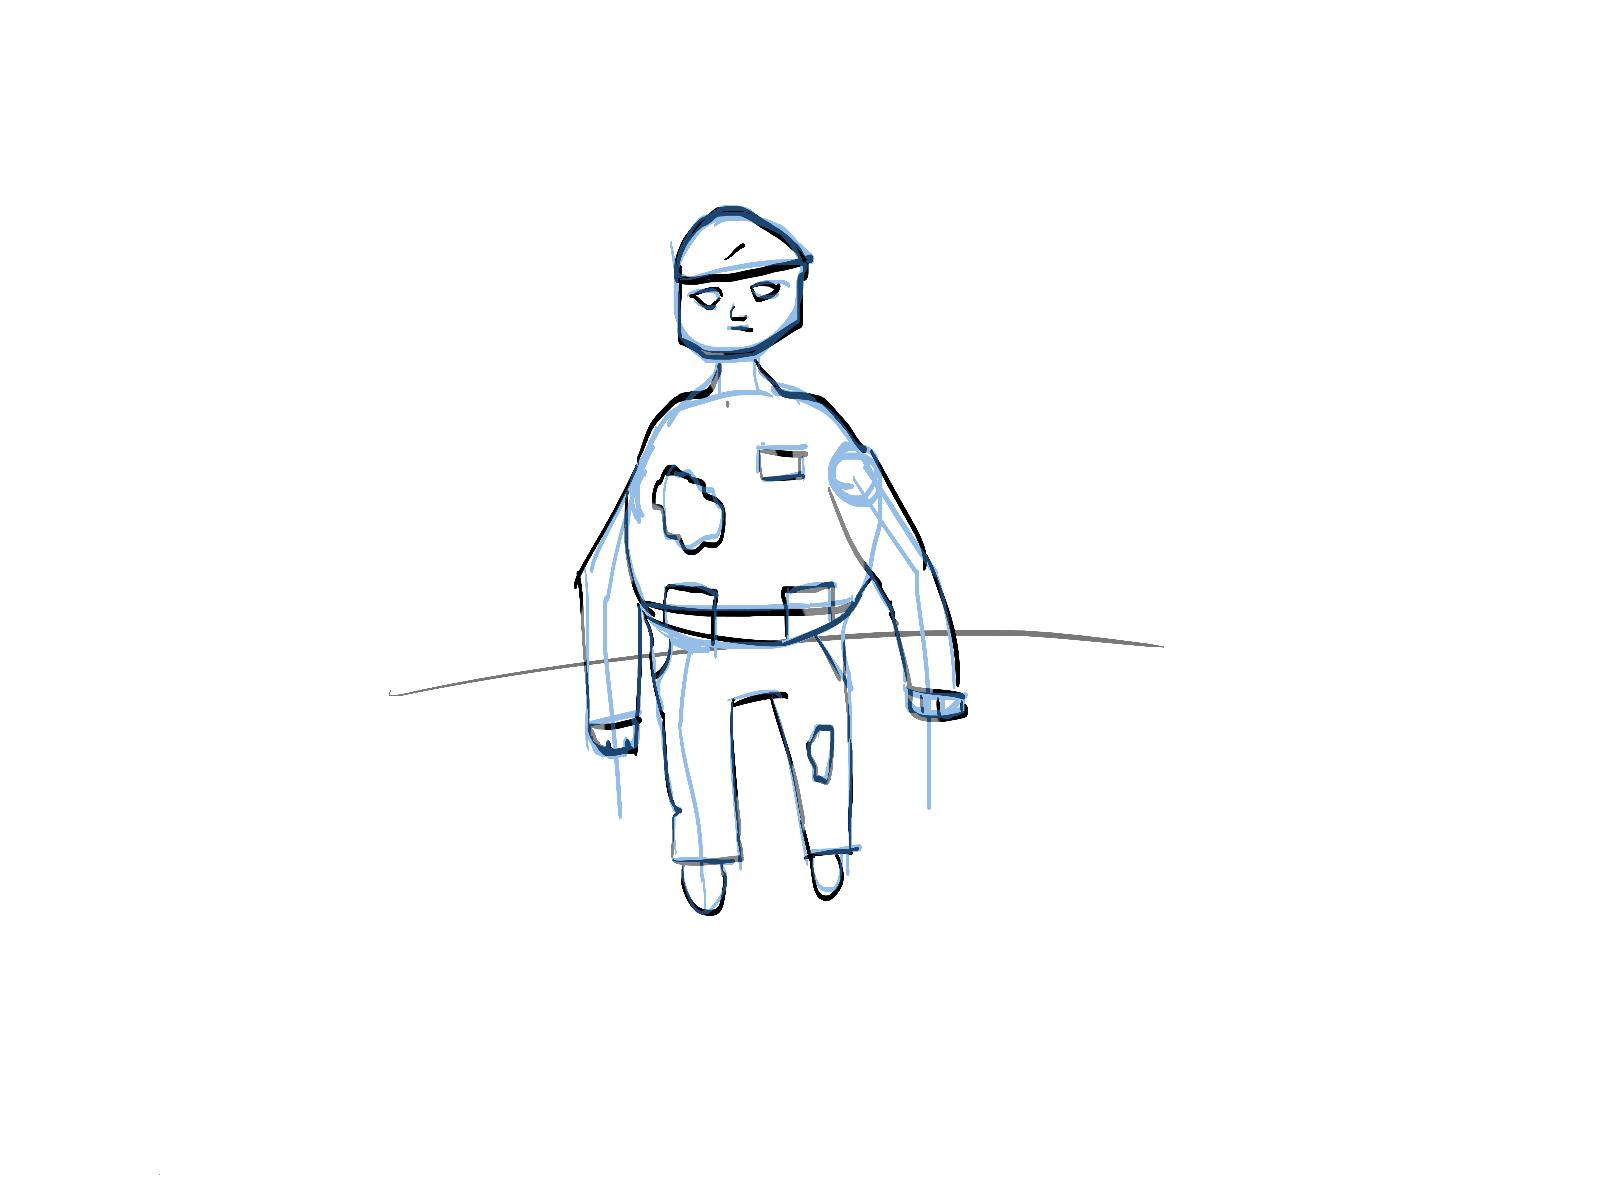 Random unfinished draw